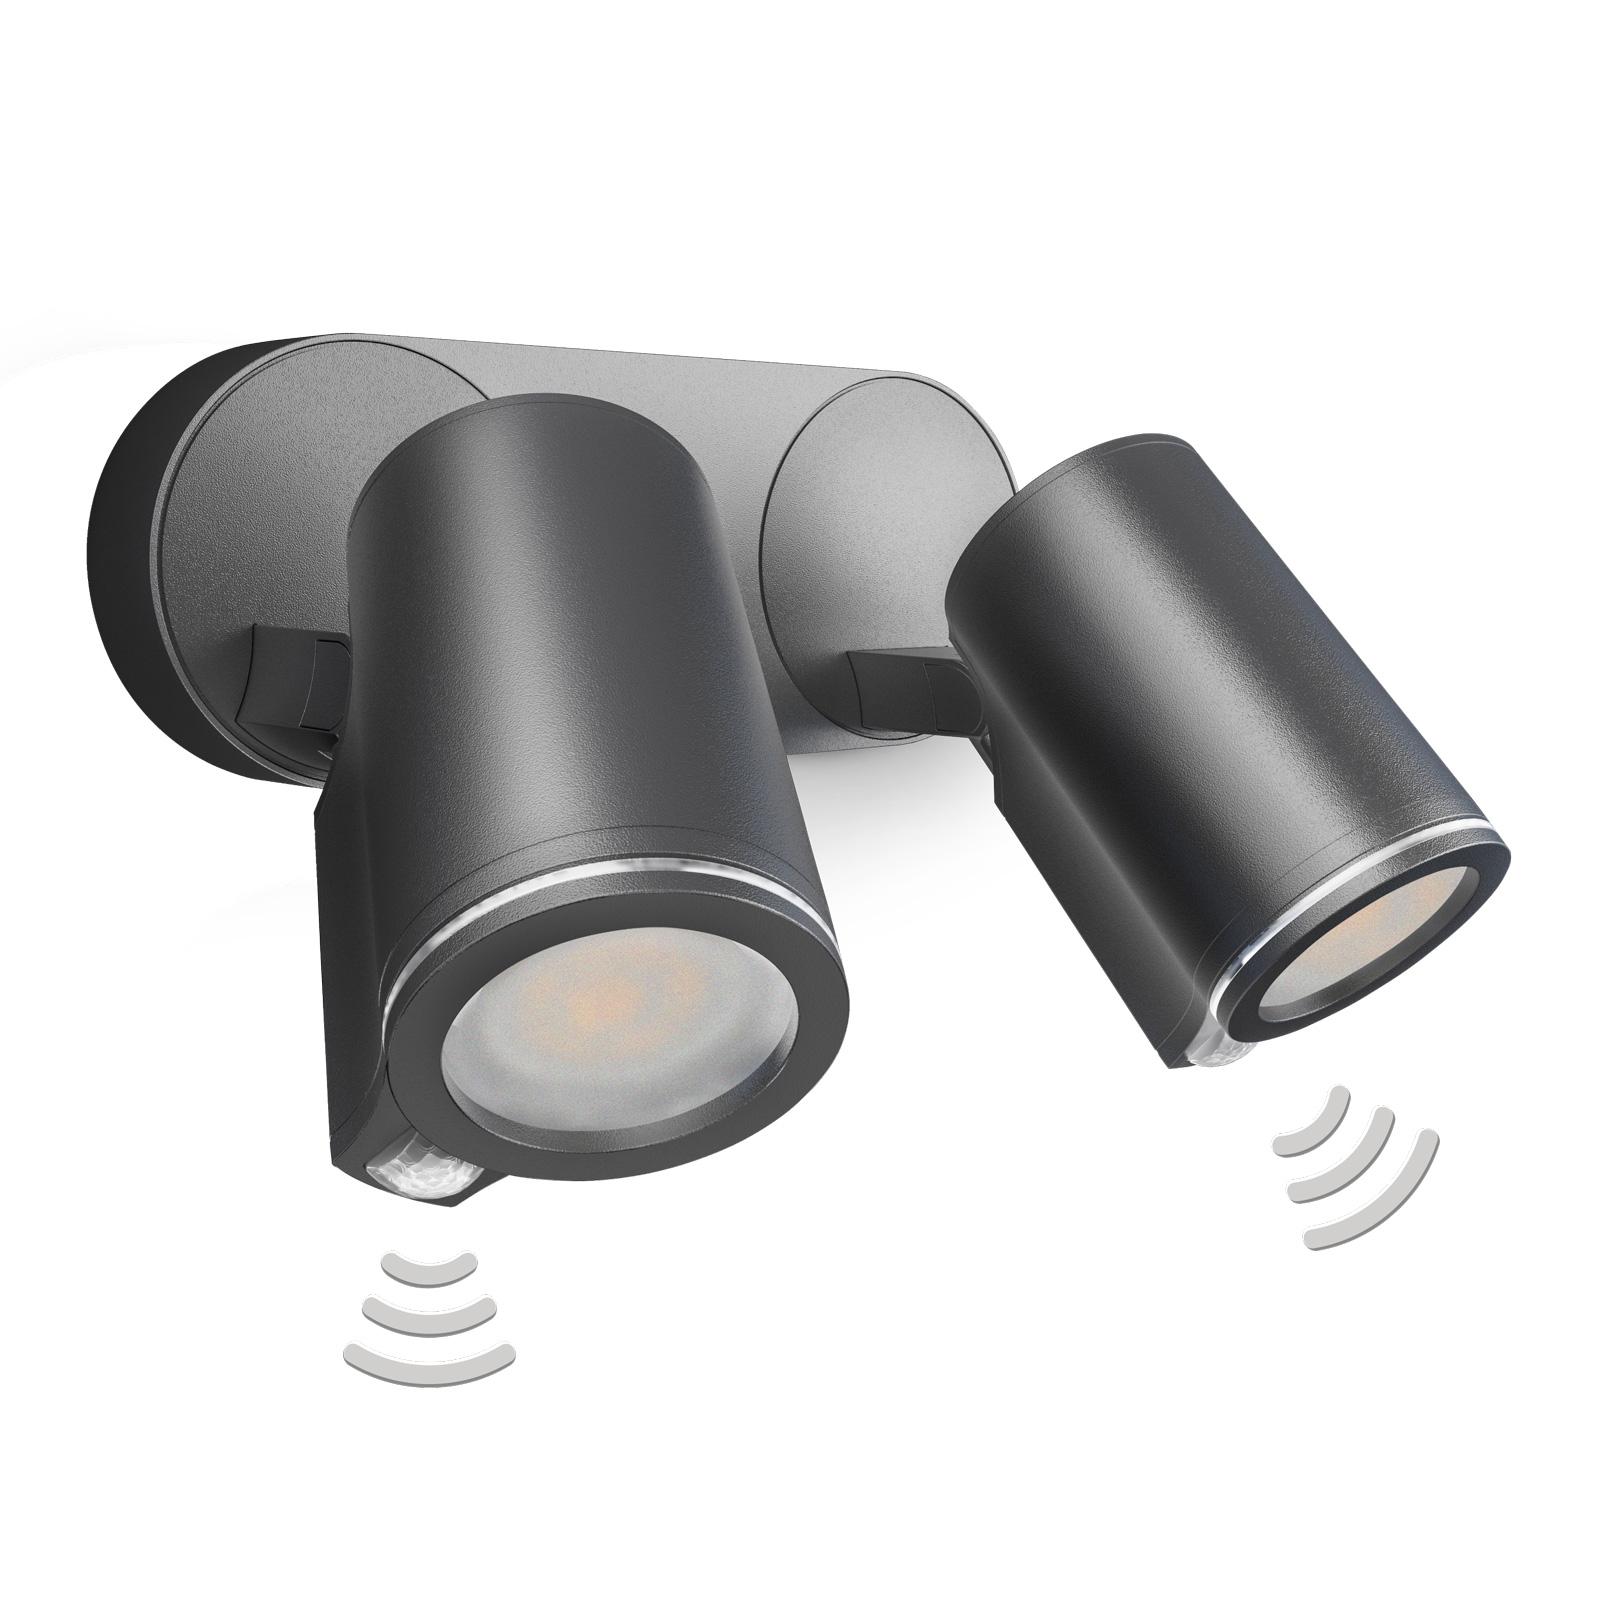 STEINEL Spot Duo Sensor Connect spot LED 2 lampes